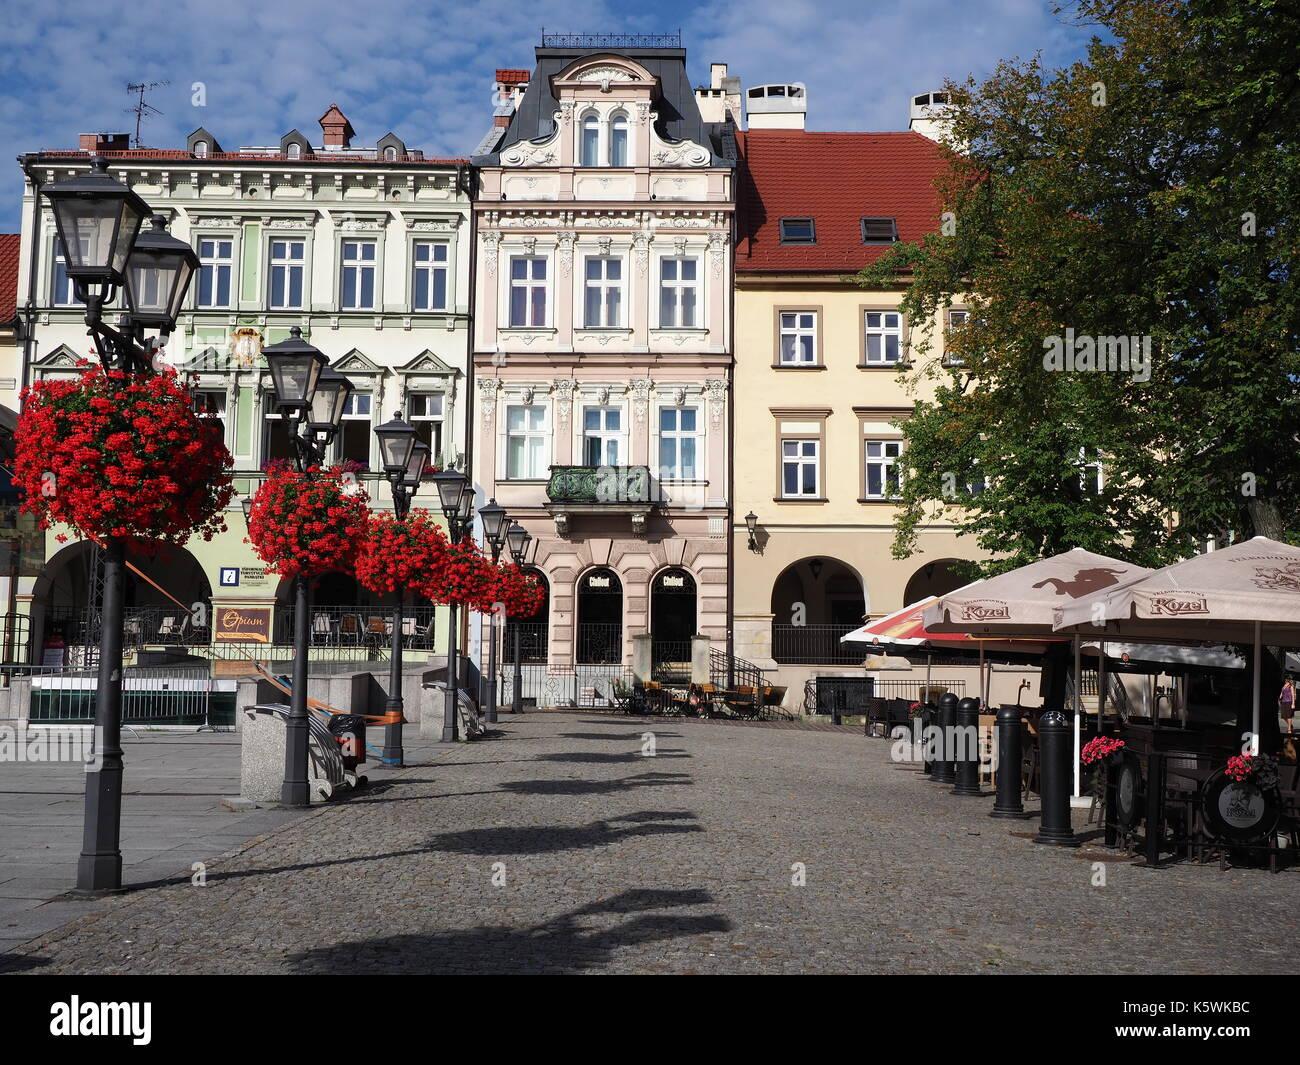 Main square in historical city center of Bielsko-Biala in Poland - Stock Image